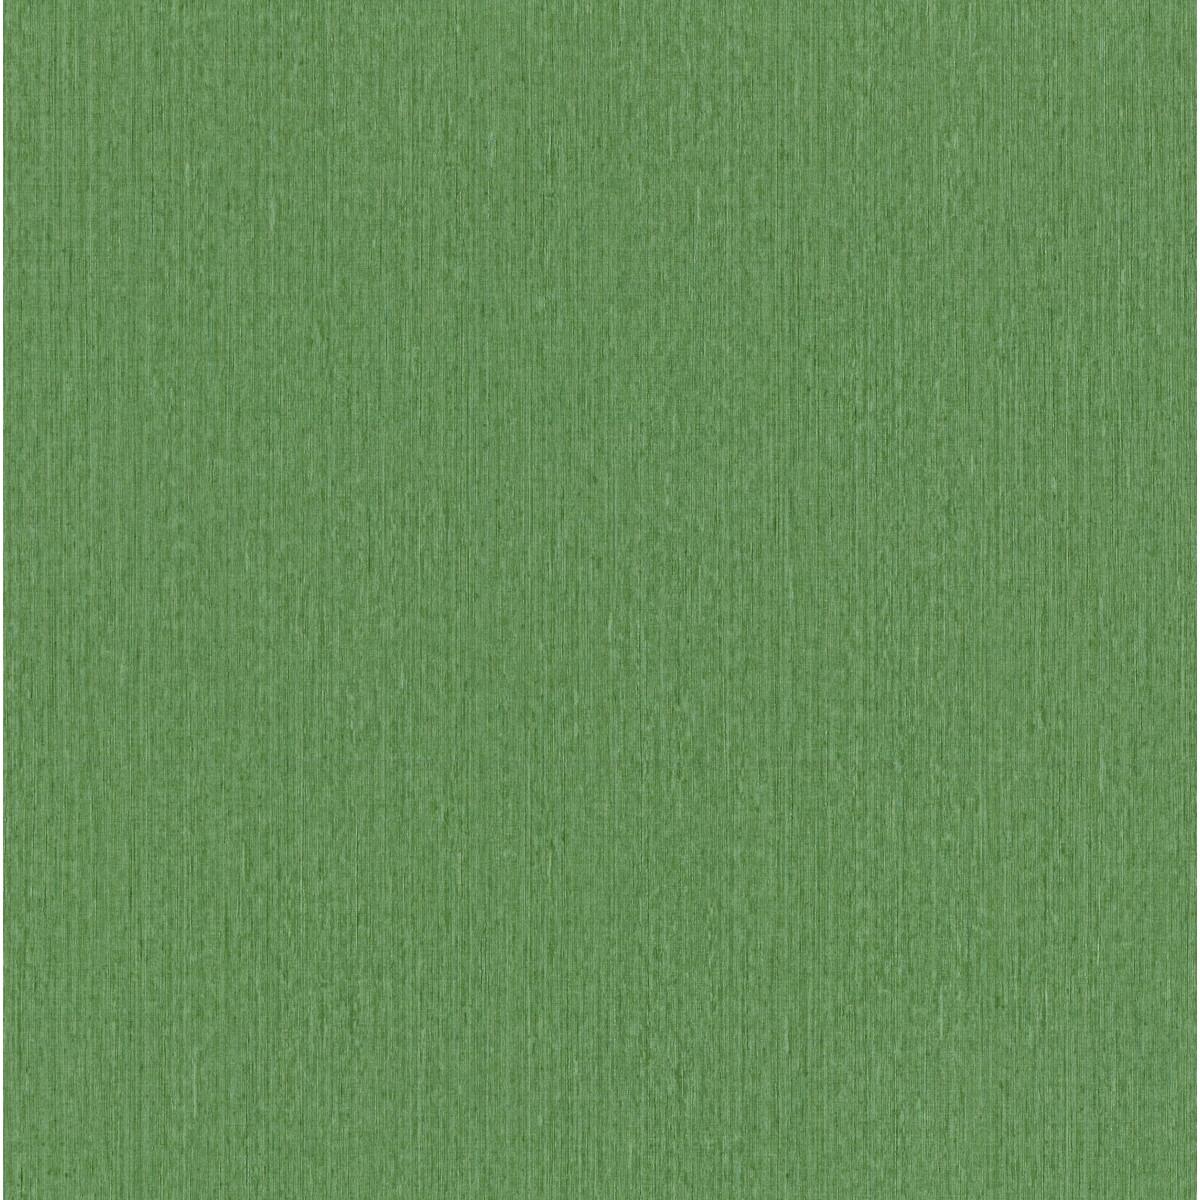 Обои флизелиновые Rasch Barbara Home Collection Ii желтые 0.53 м 537178